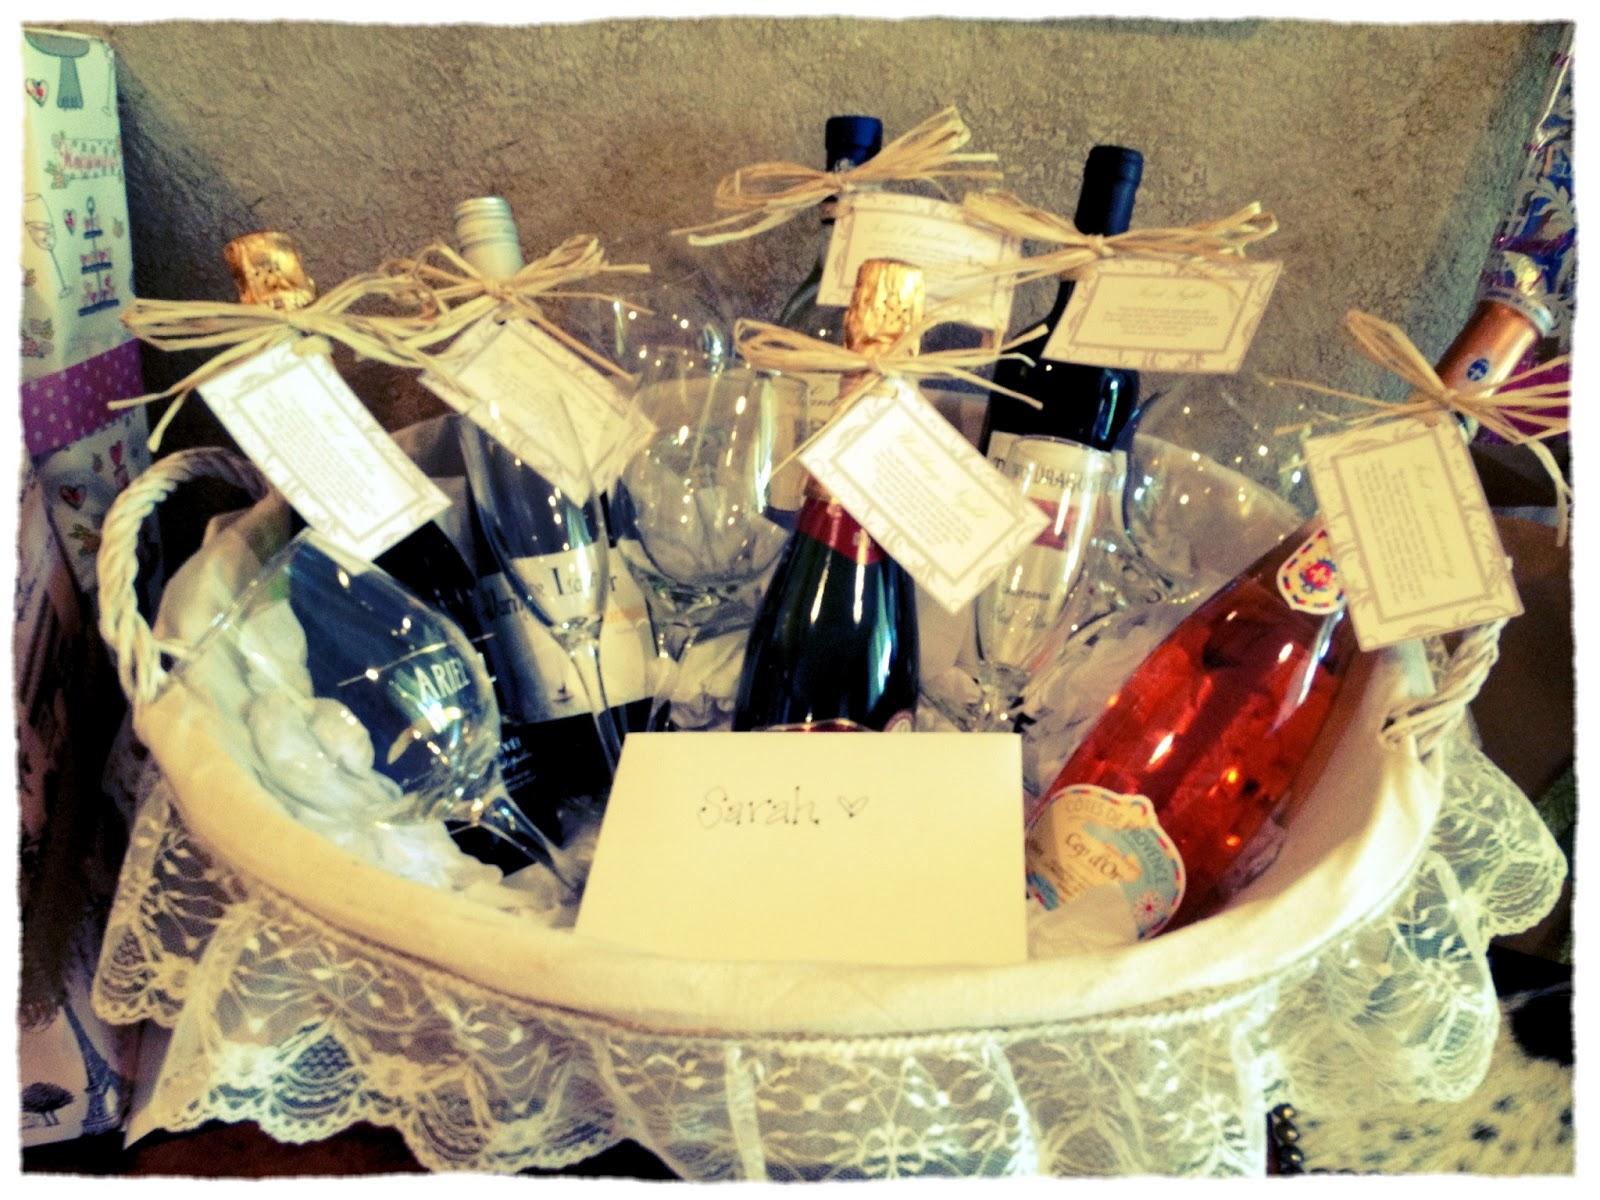 Diy Wedding Shower Gift Basket : Diy Wedding Gift Baskets Its a wine gift basket with